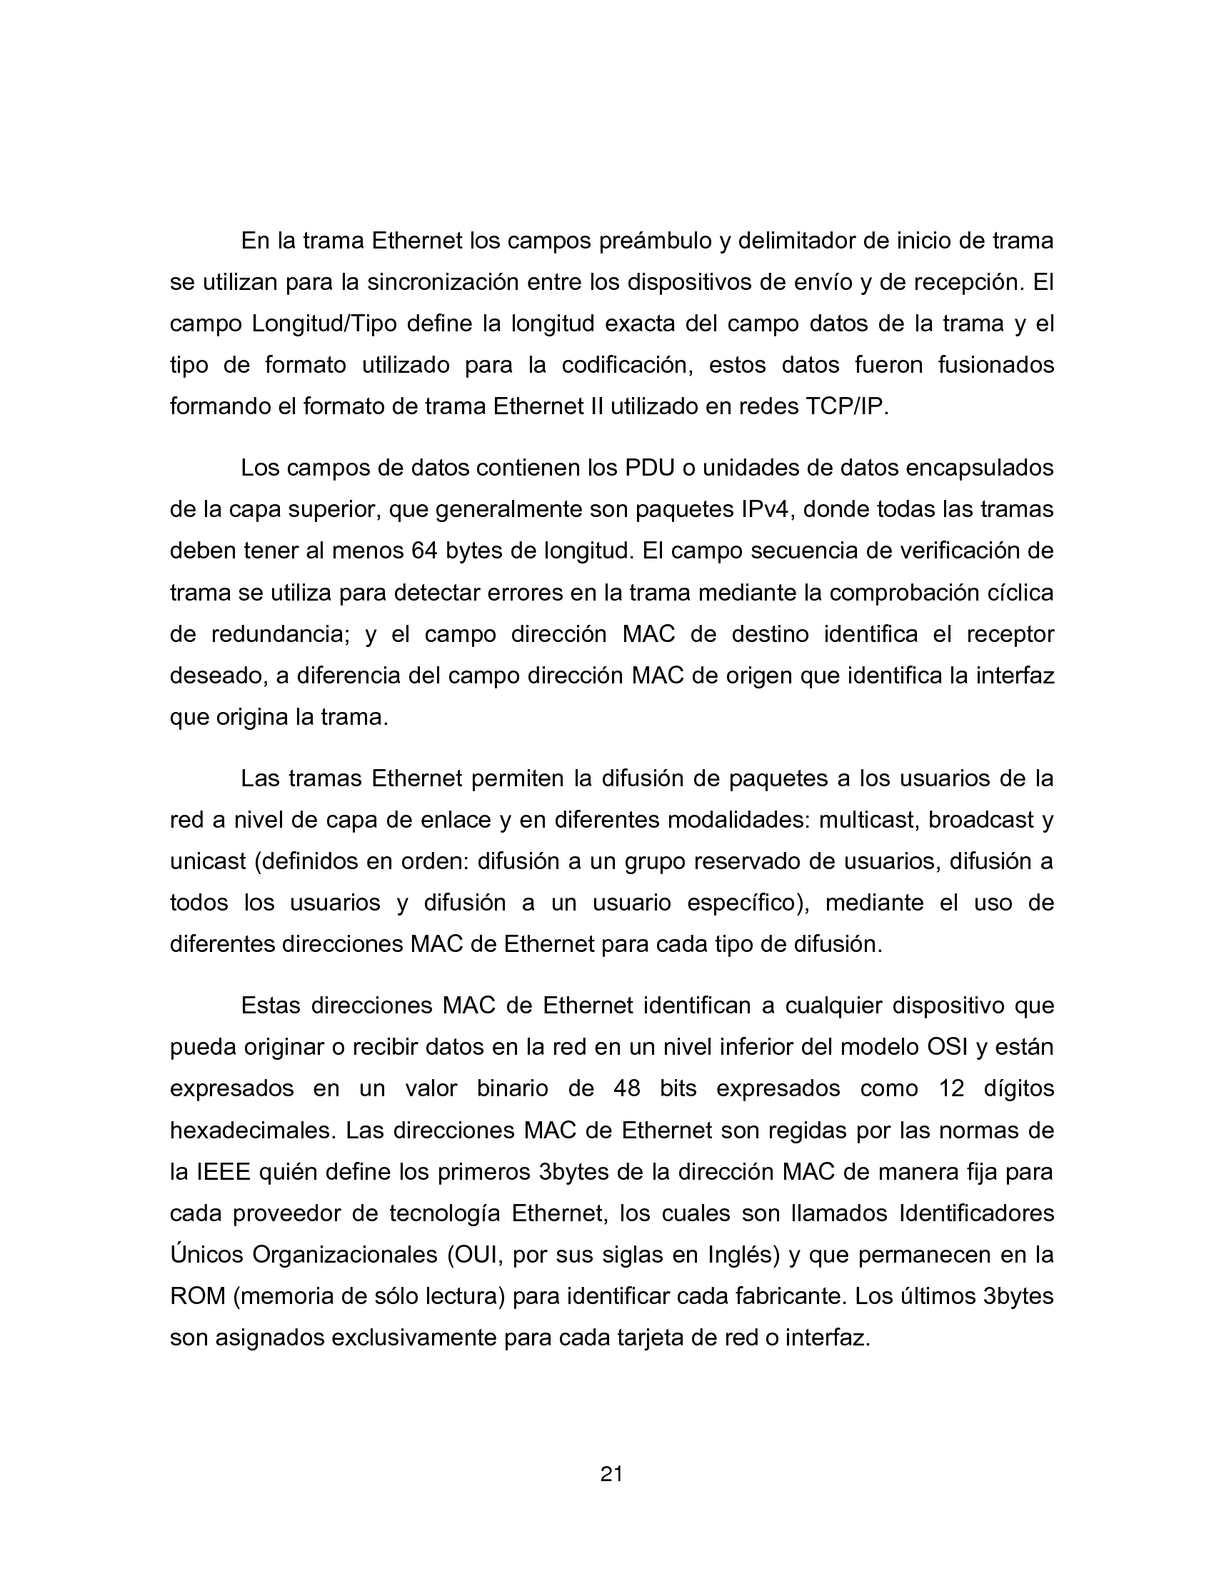 PROYECTO COMPLETO DE RED LAN - CALAMEO Downloader